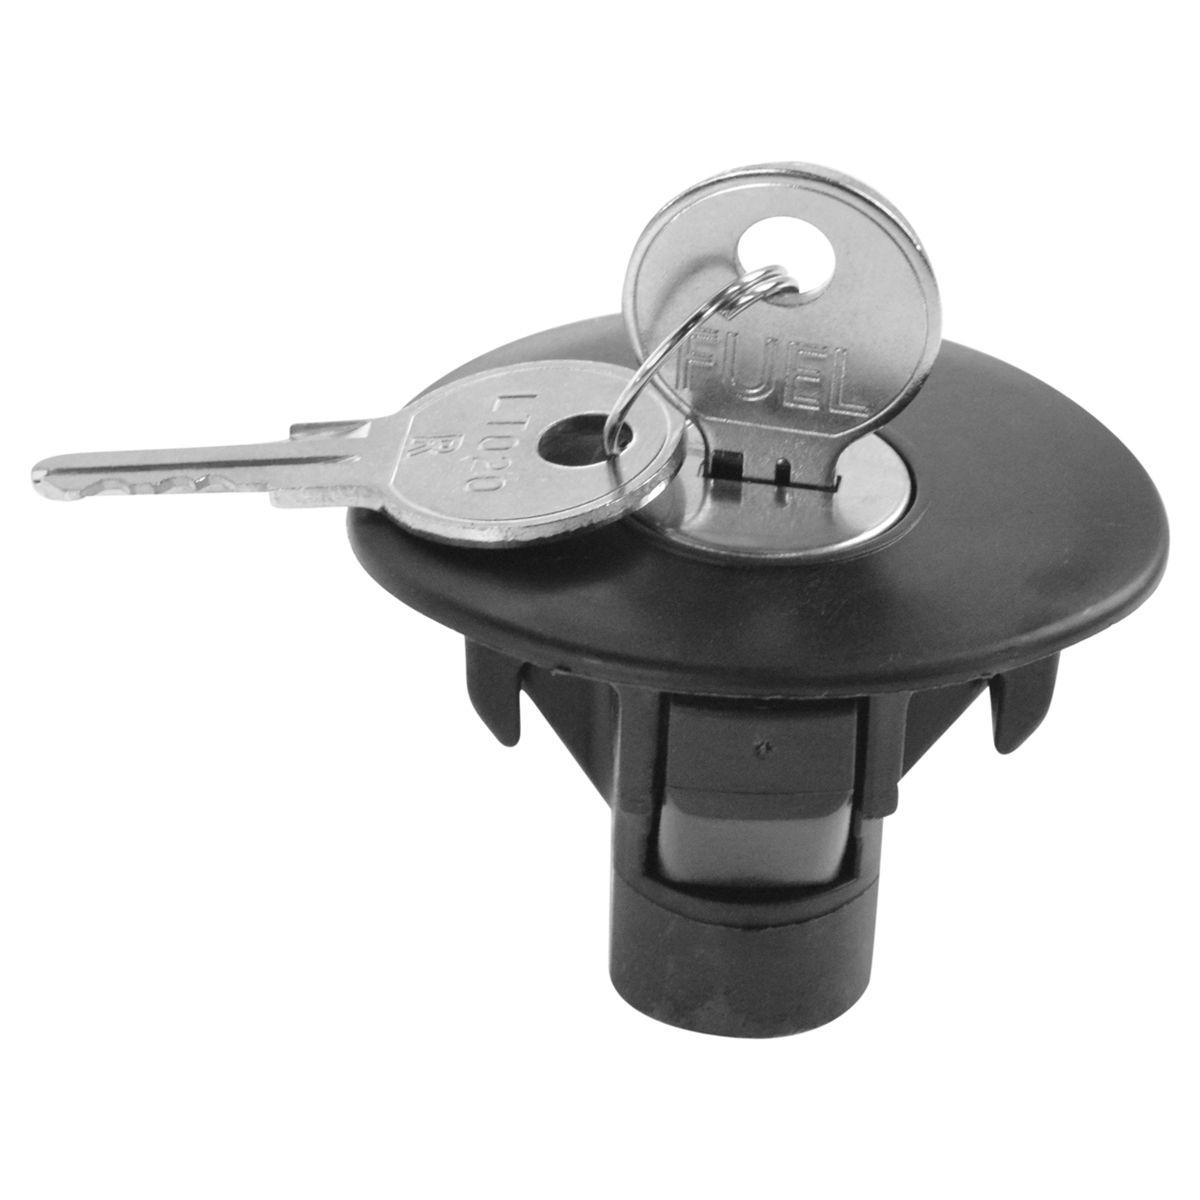 Tamper Proof Security Protect NEW OEM Ford Locking Fuel Plug Gas Cap w// Keys